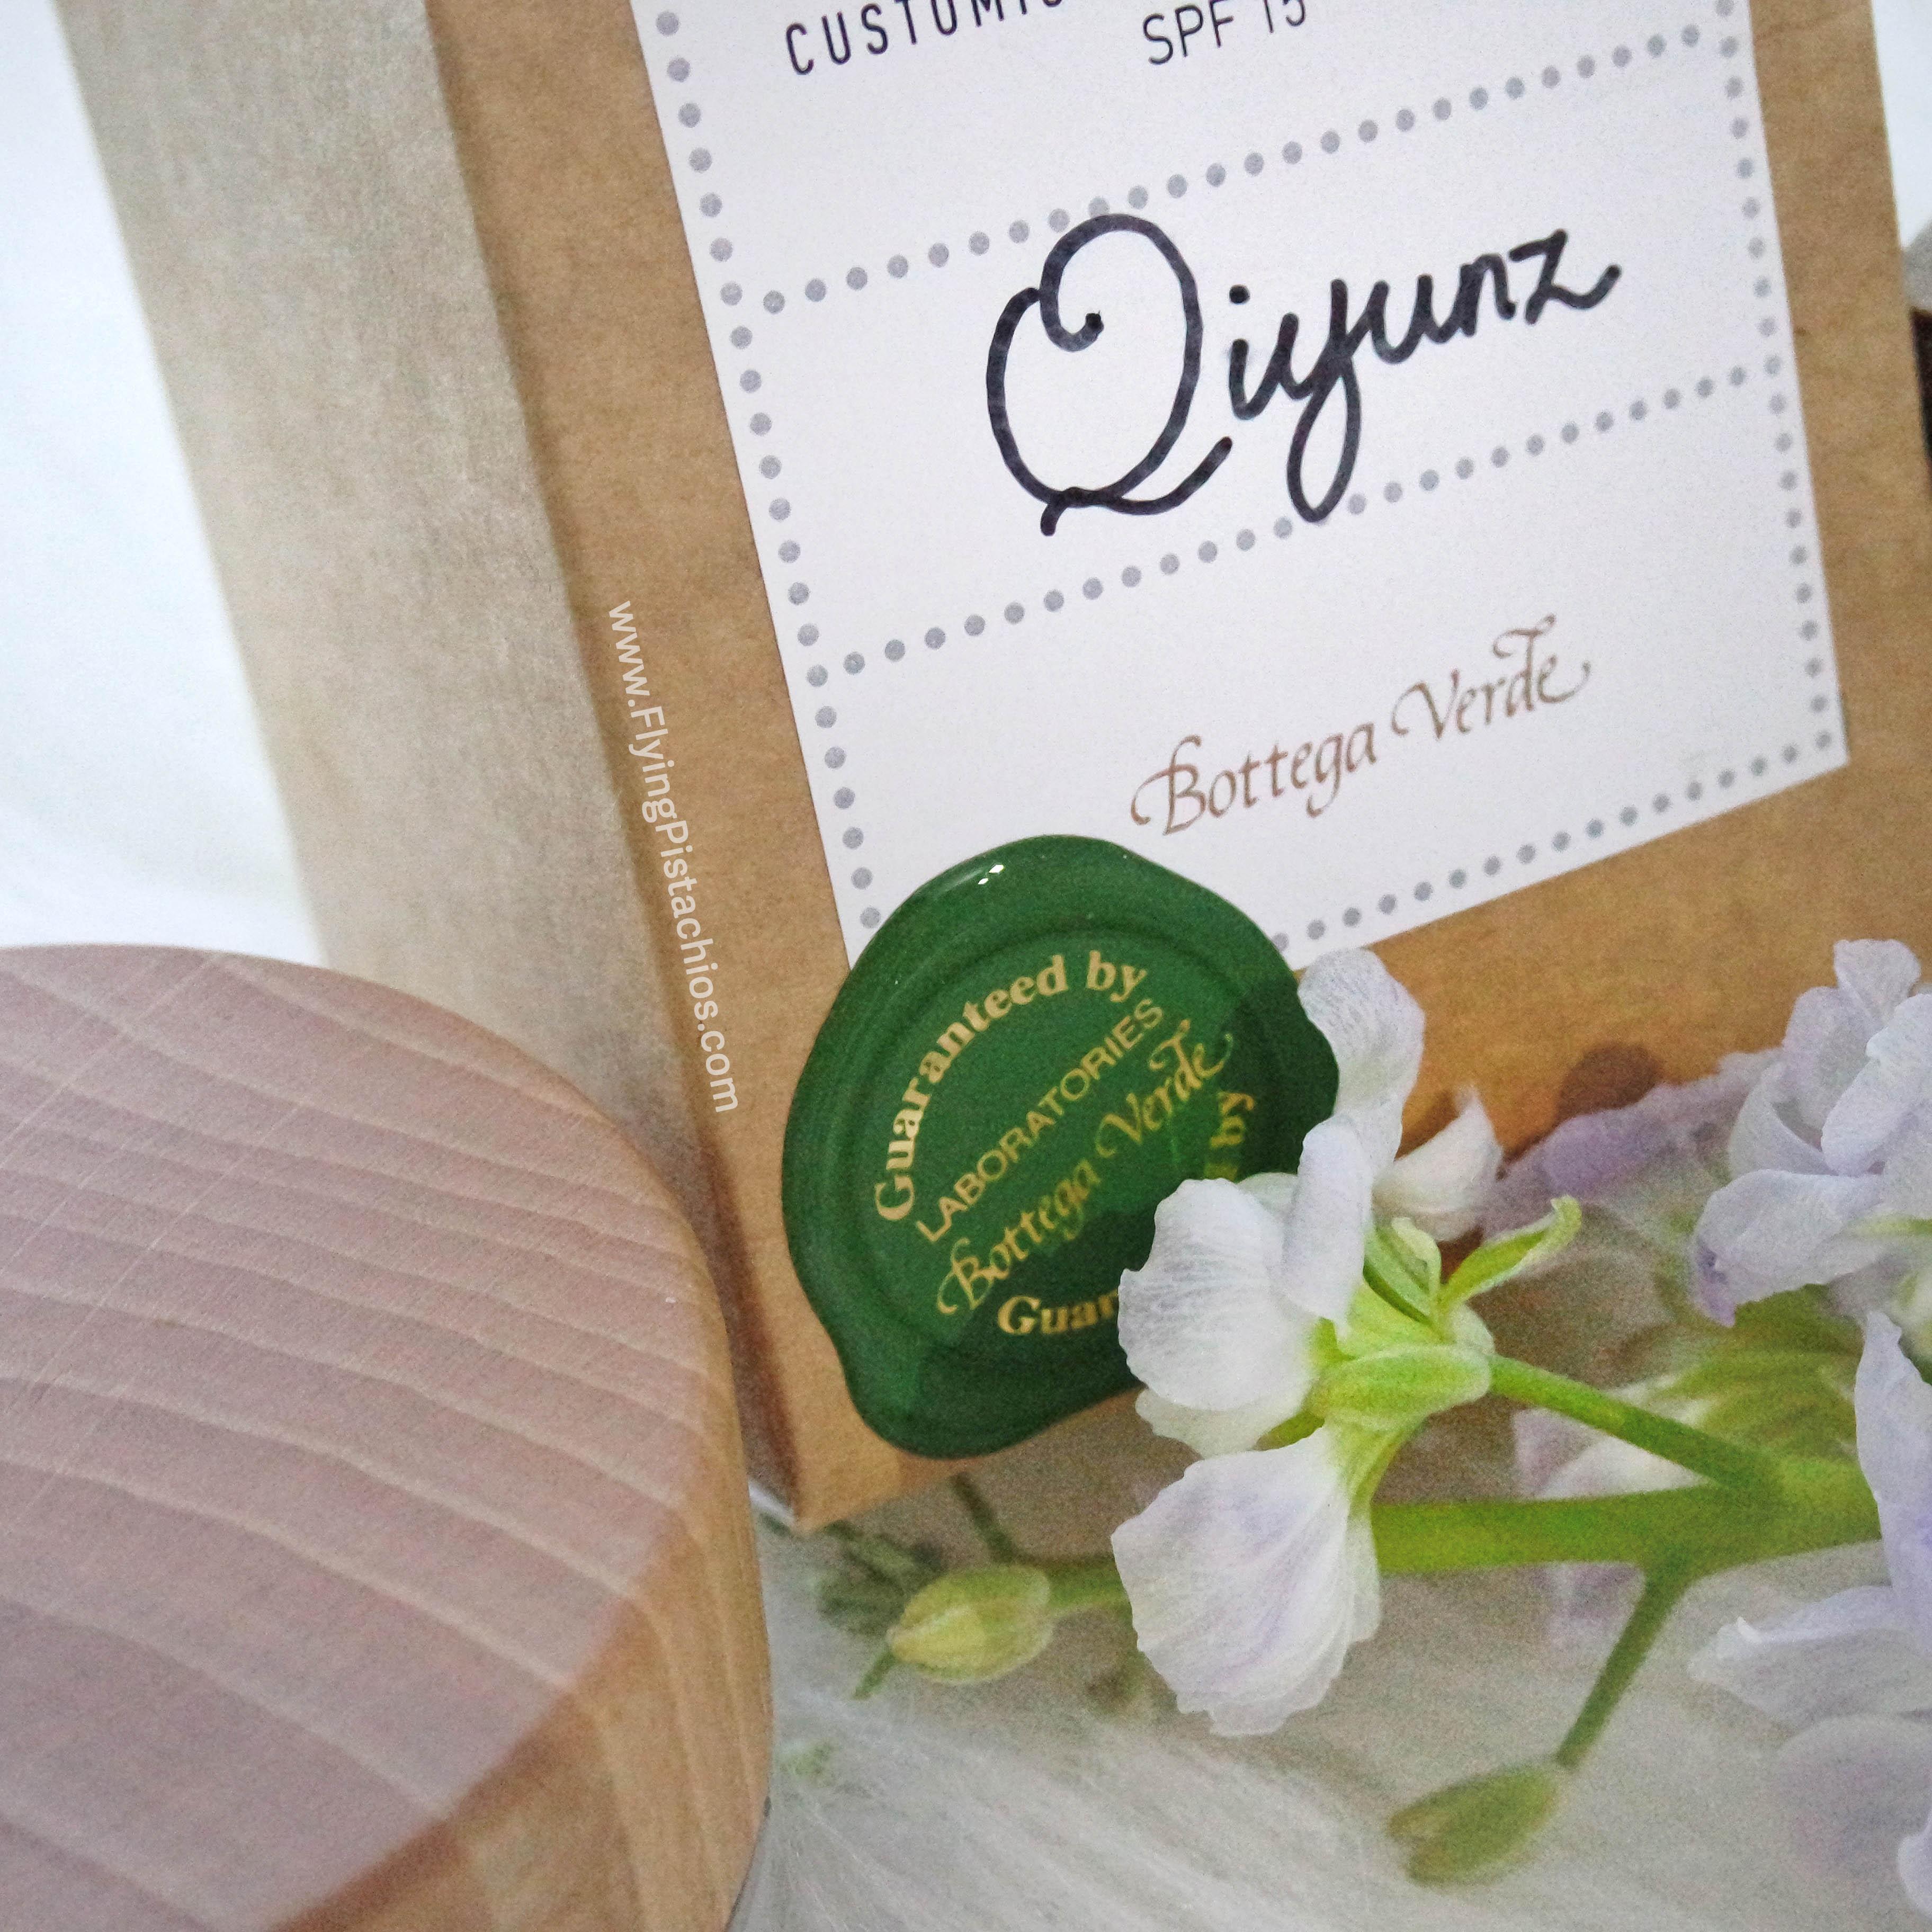 Bottega Verde Singapore Review